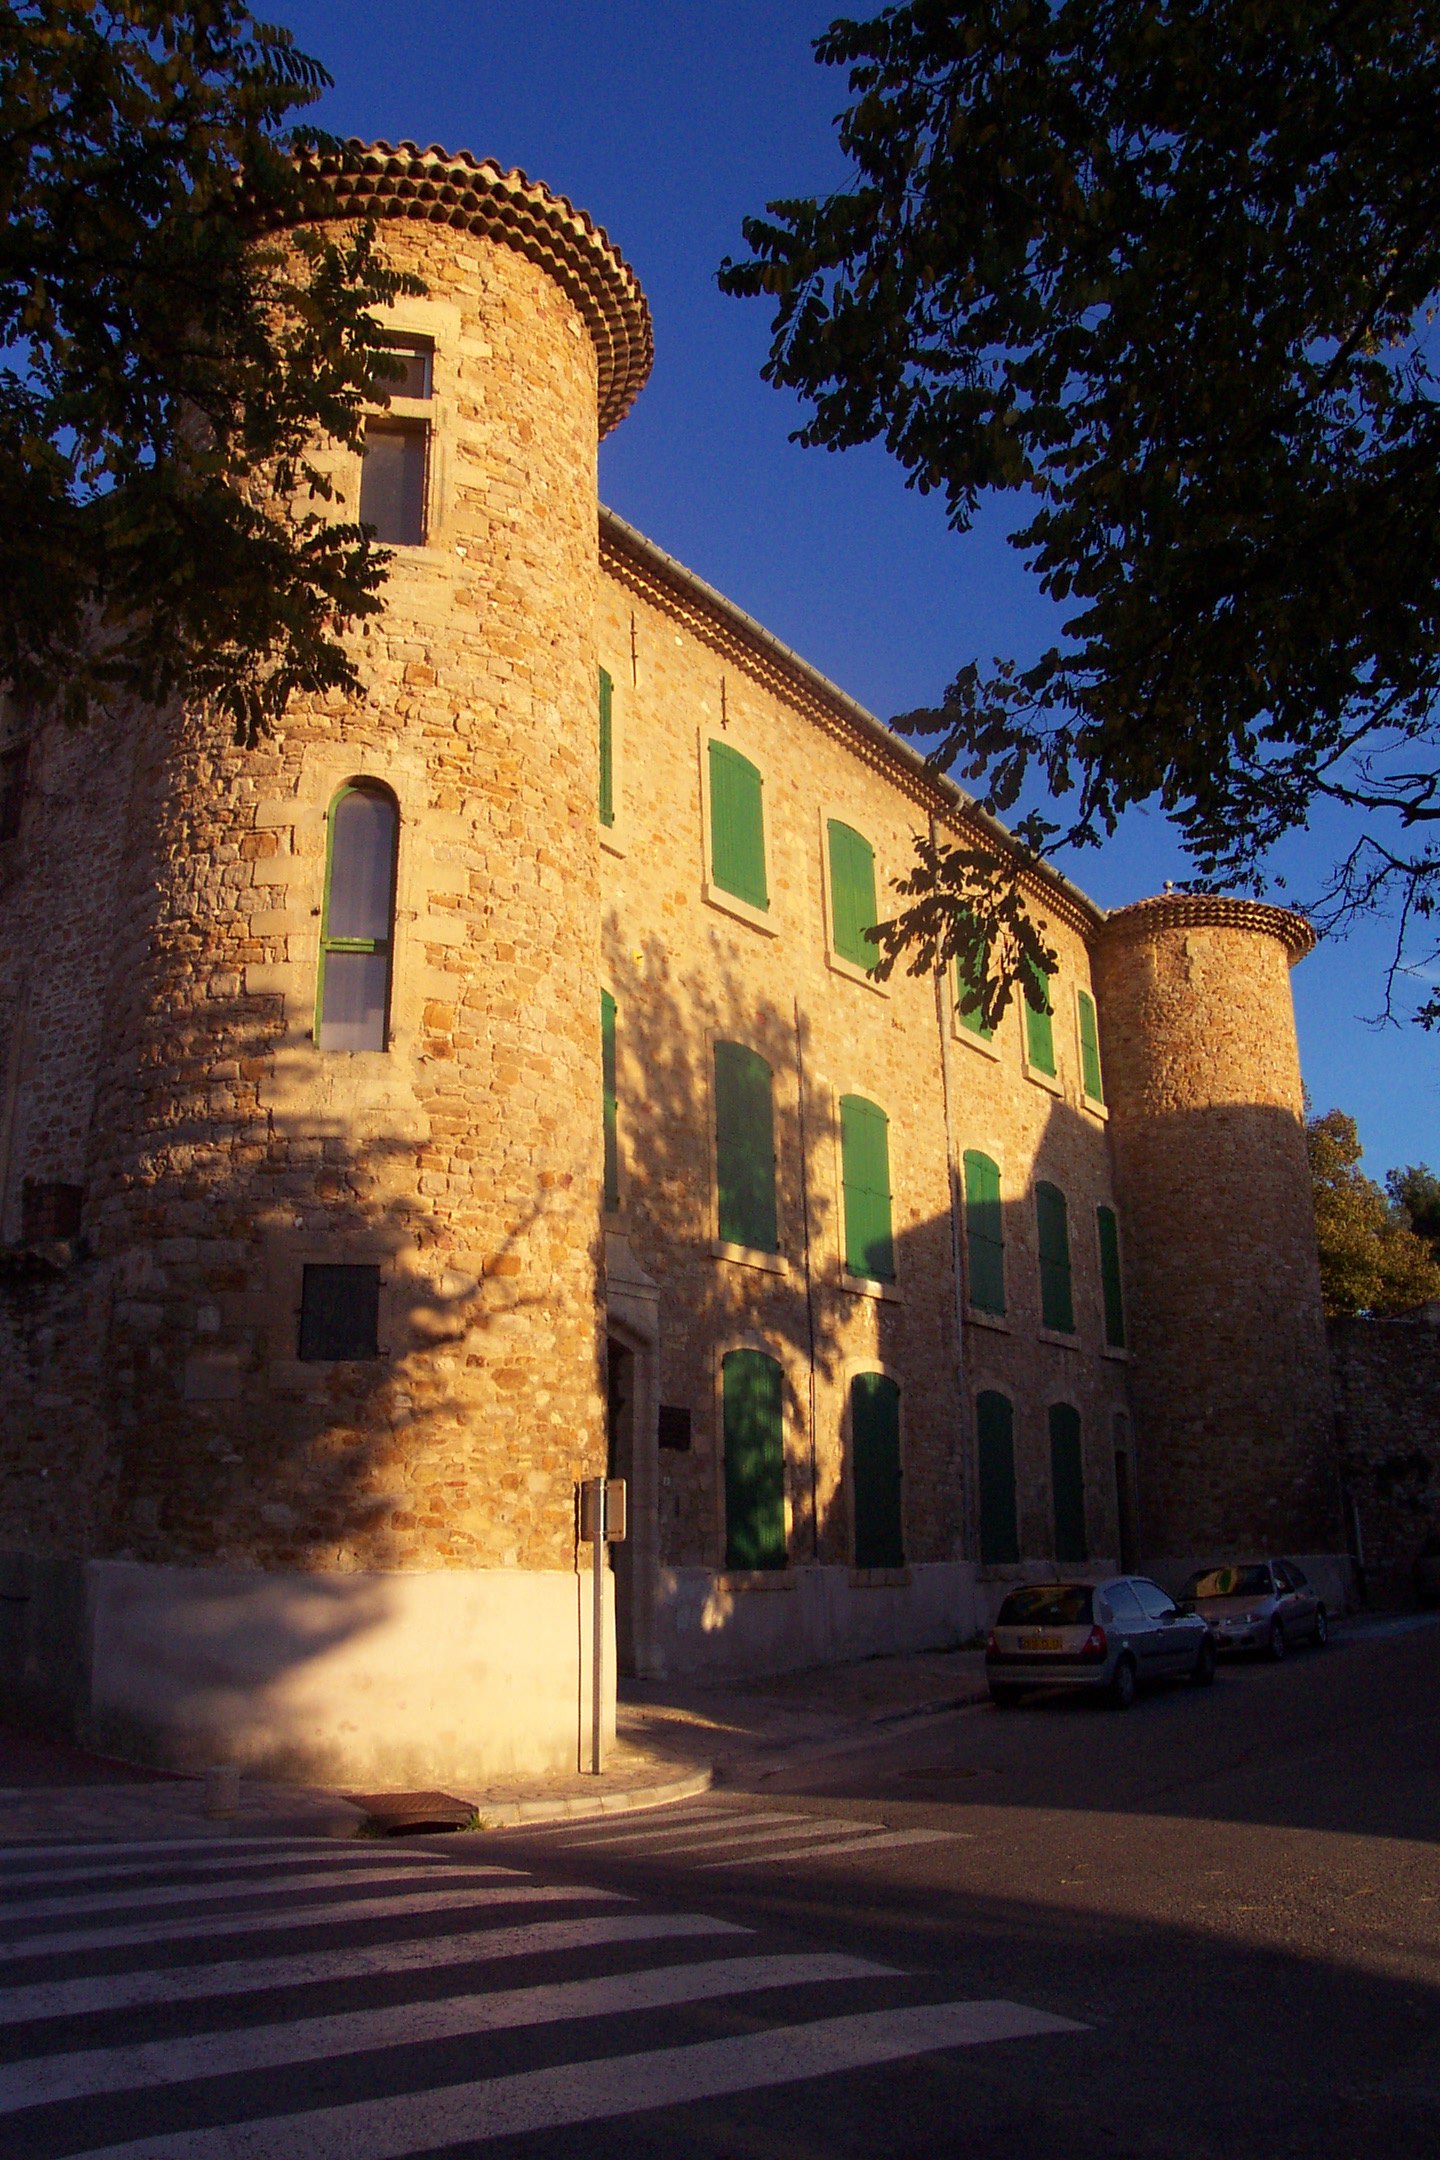 Le château de Peynier